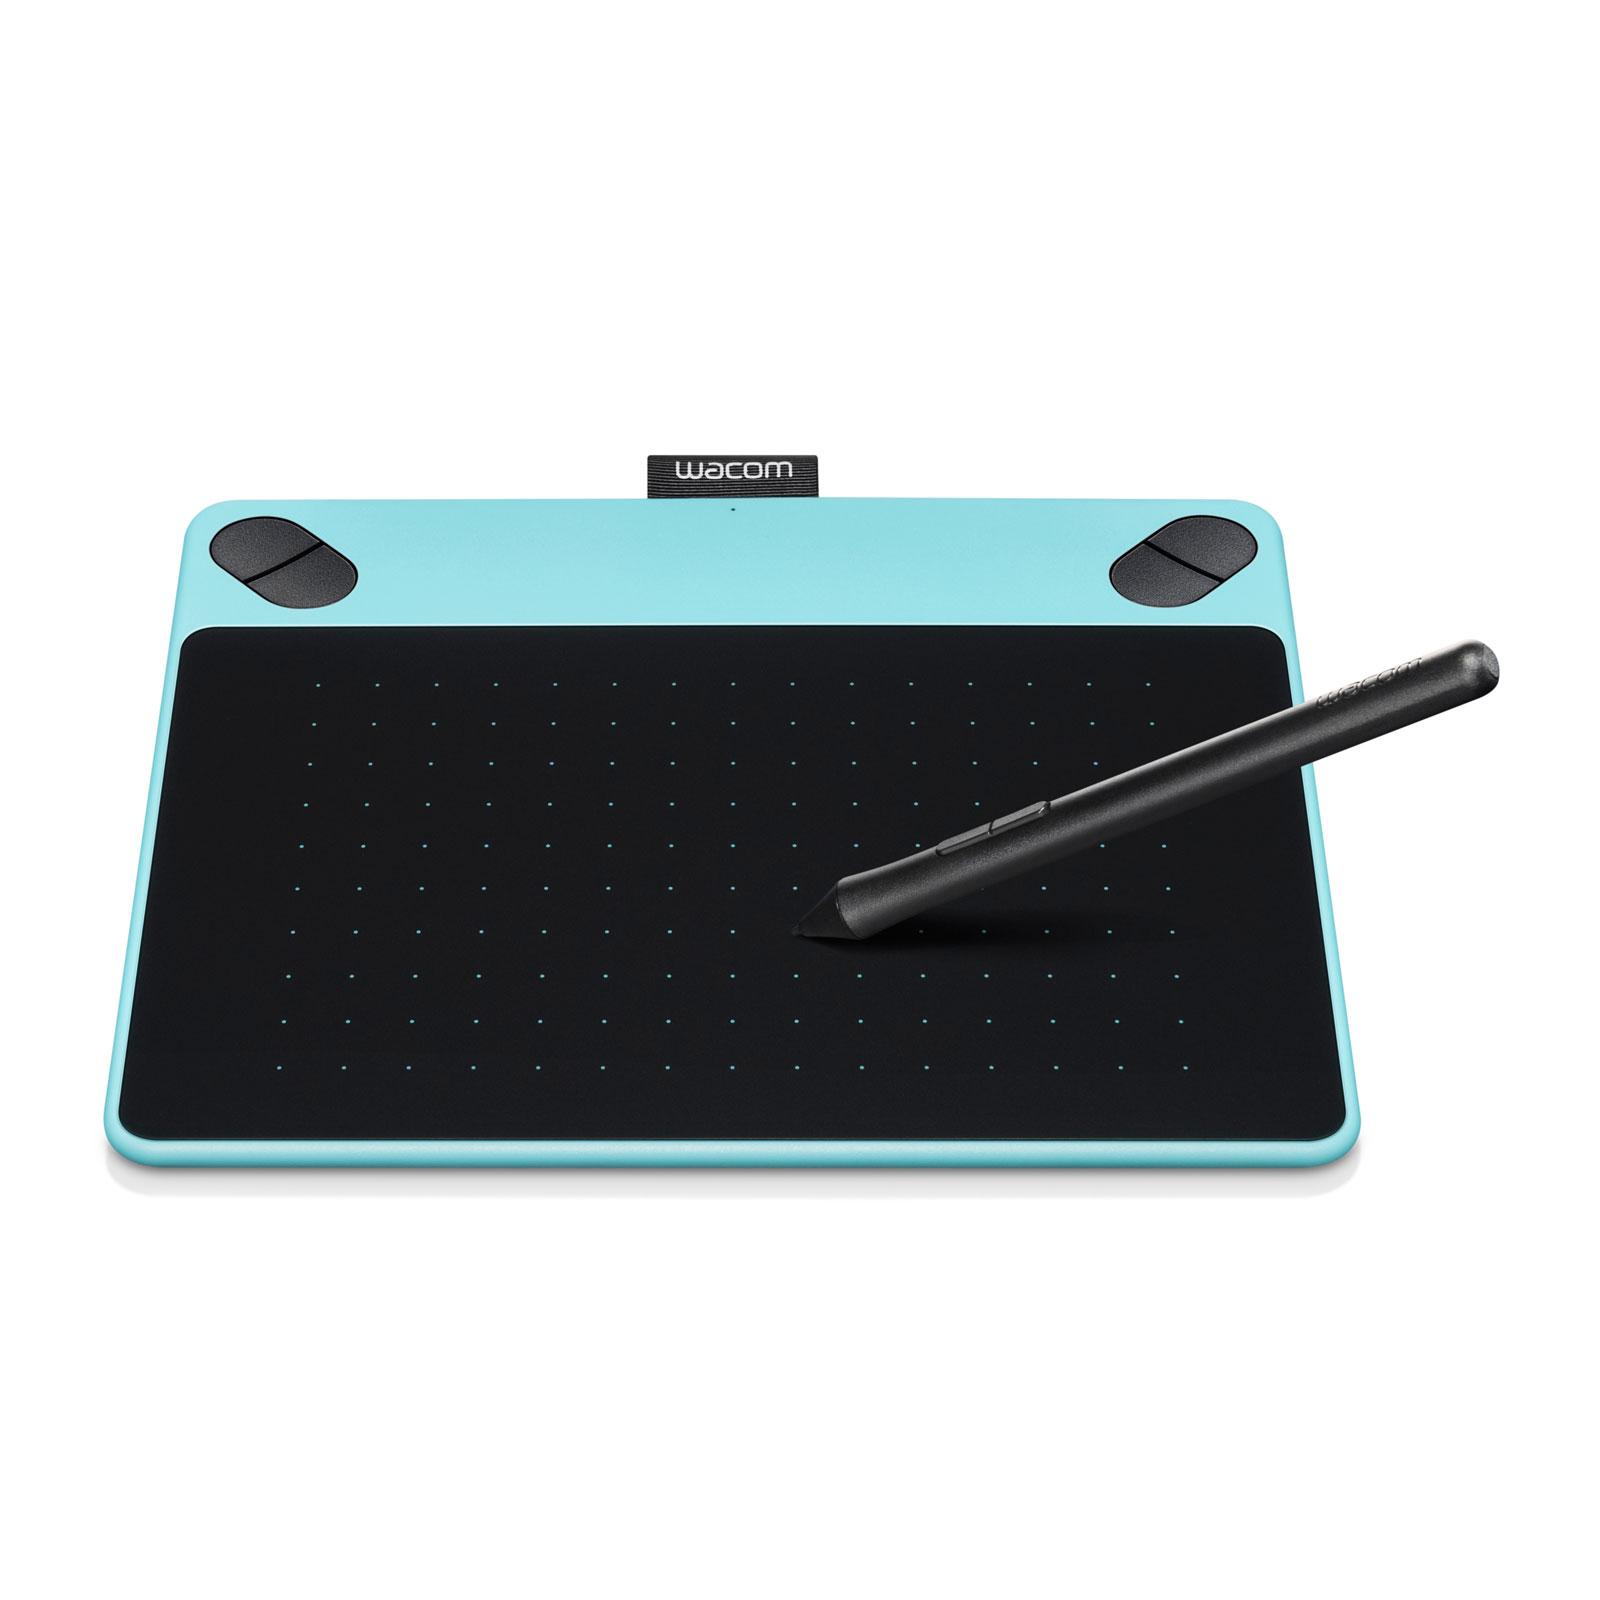 wacom intuos comic small bleu tablette graphique wacom sur. Black Bedroom Furniture Sets. Home Design Ideas